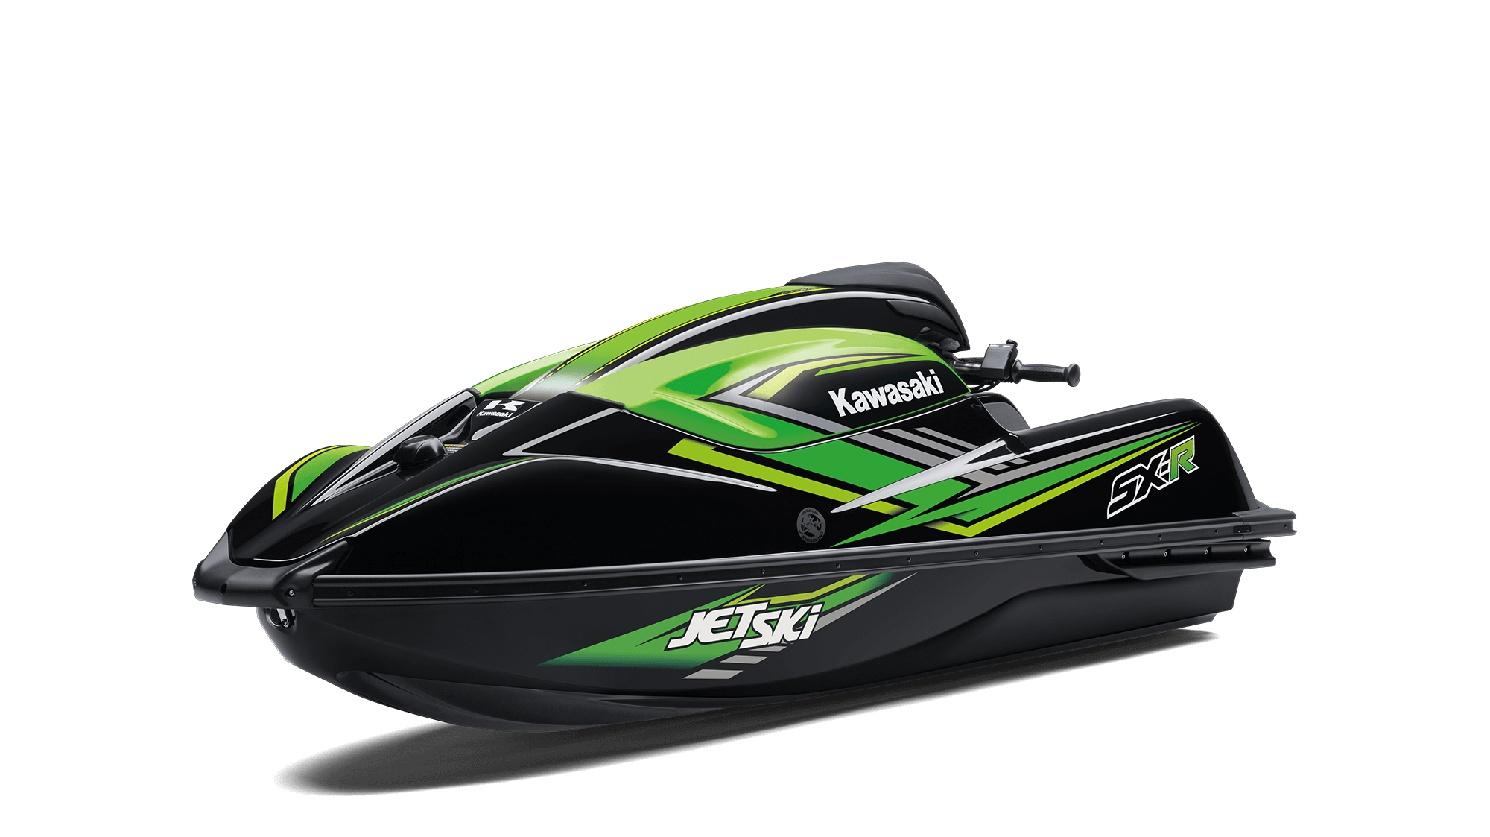 Kawasaki JET SKI SX-R Ébène / Vert Lime 2020